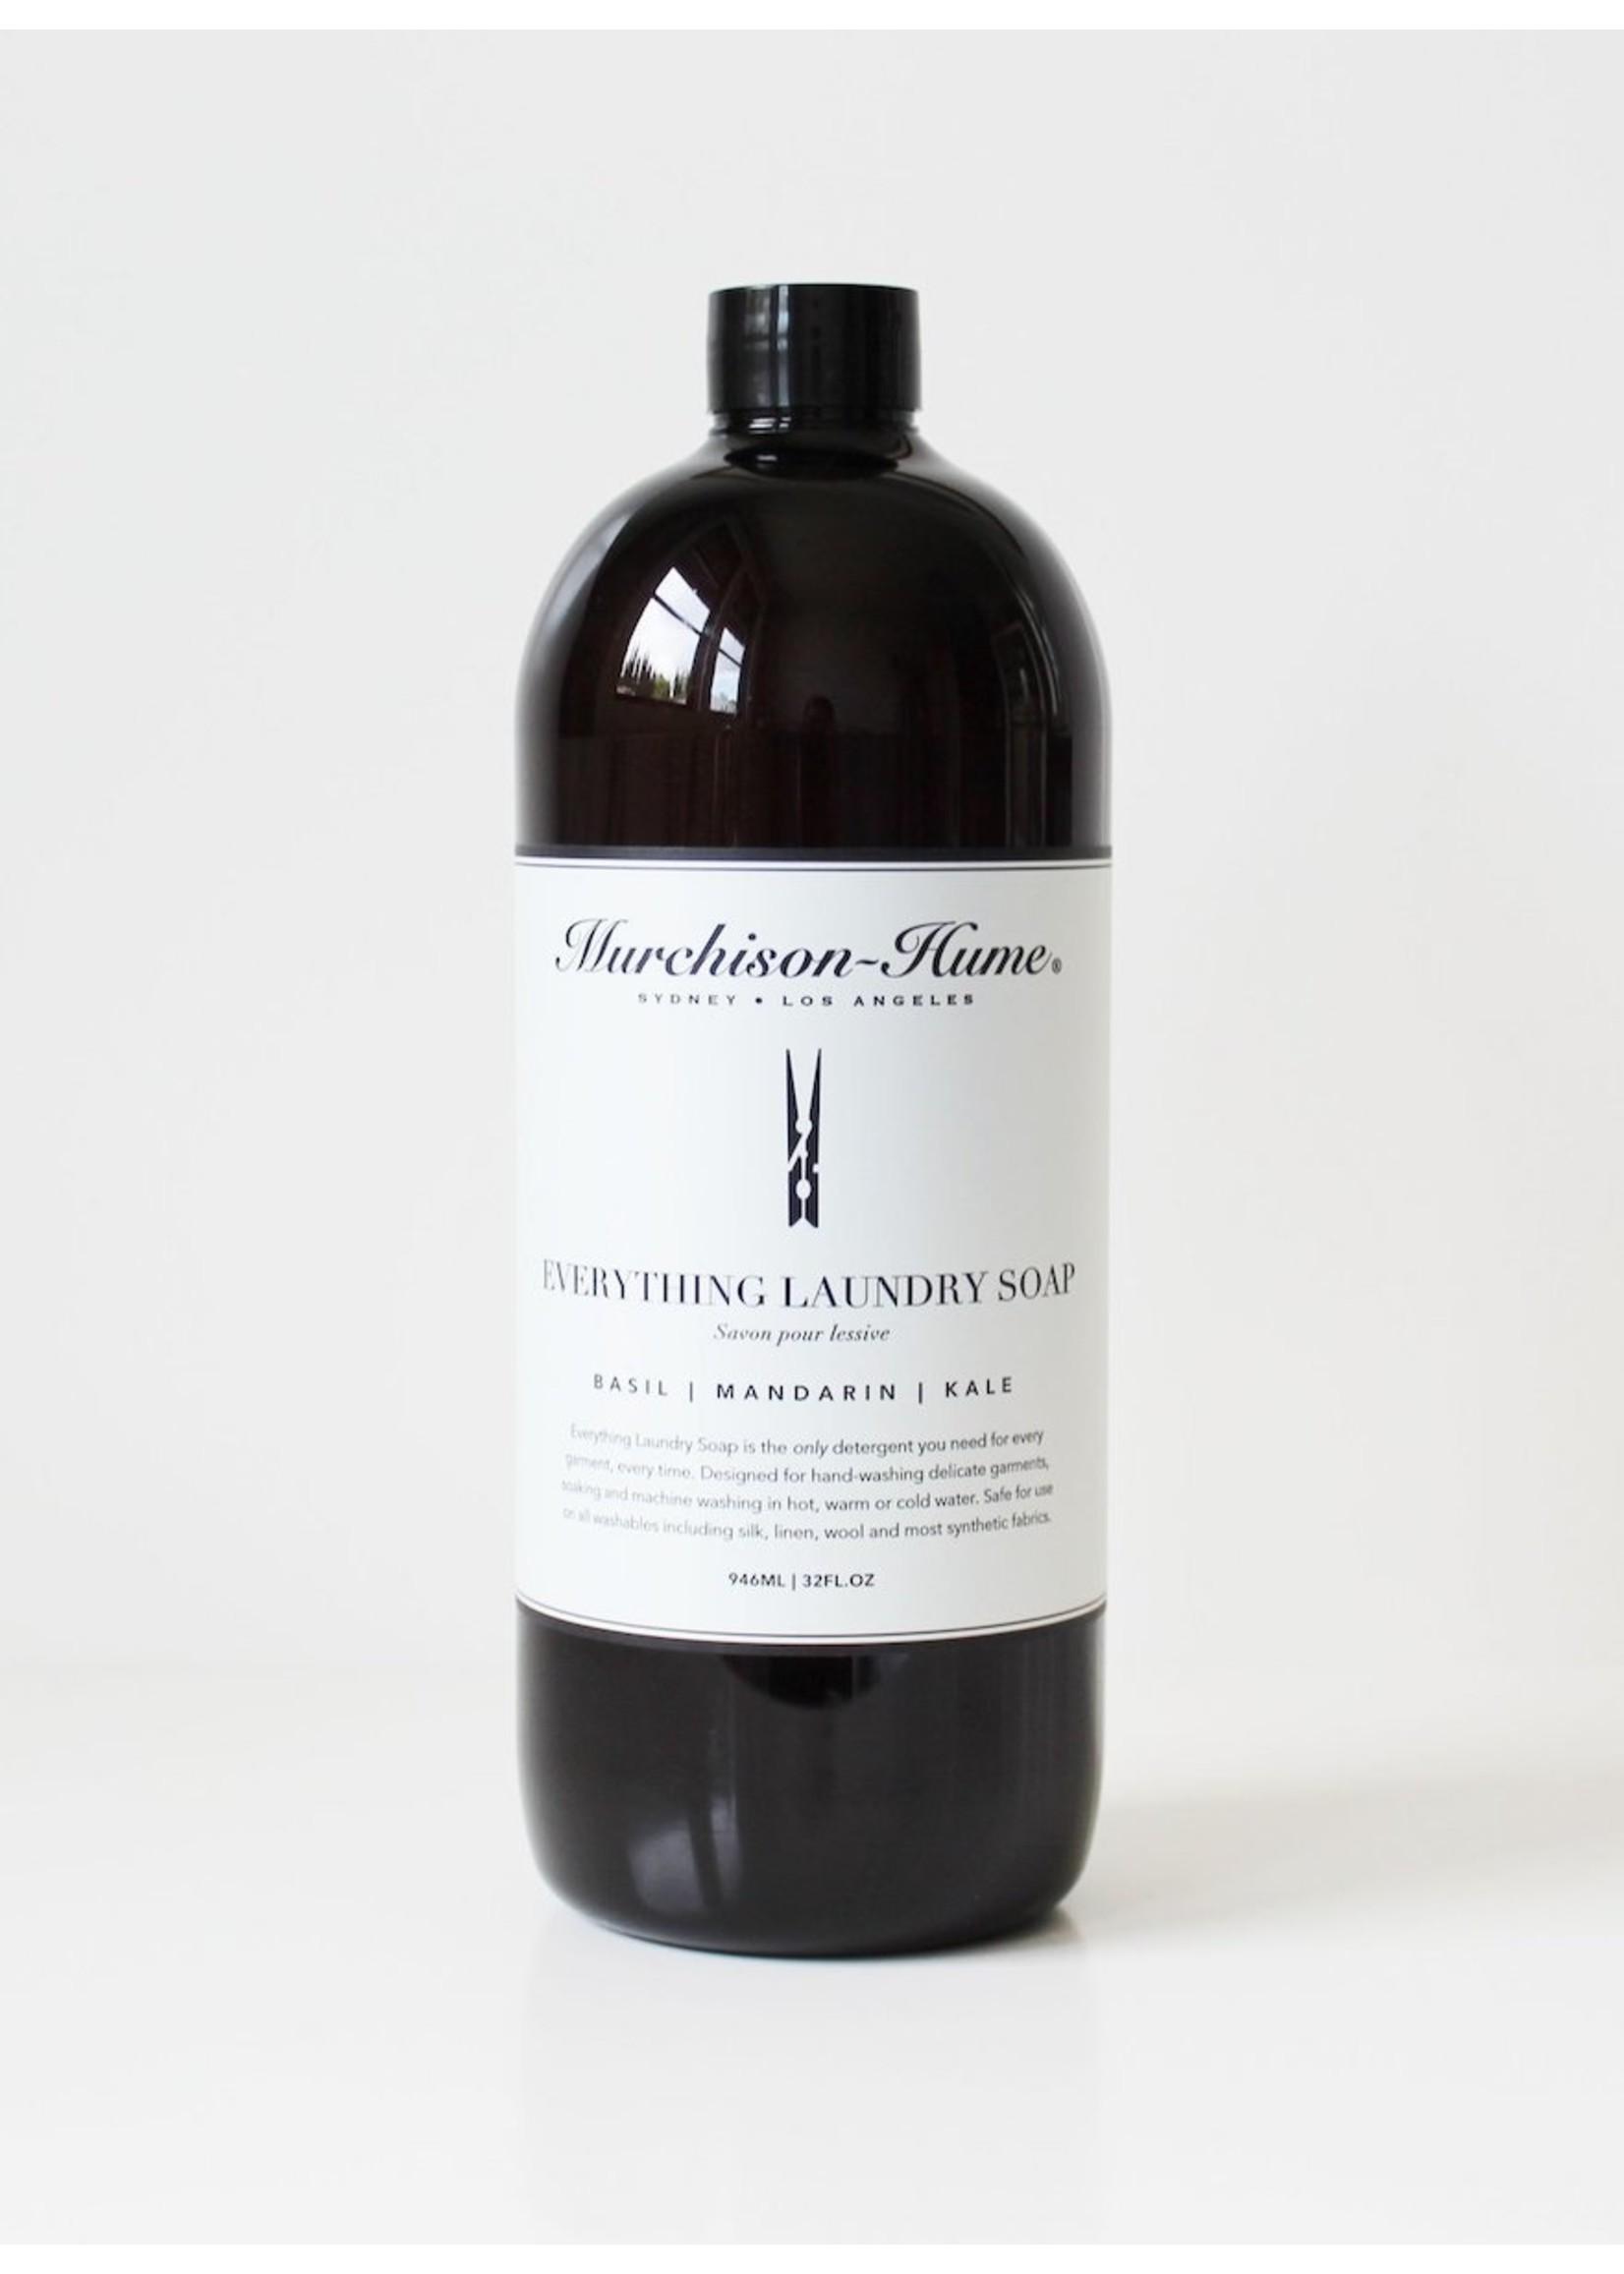 Murchison-Hume Basil & Mandarin Laundry Soap